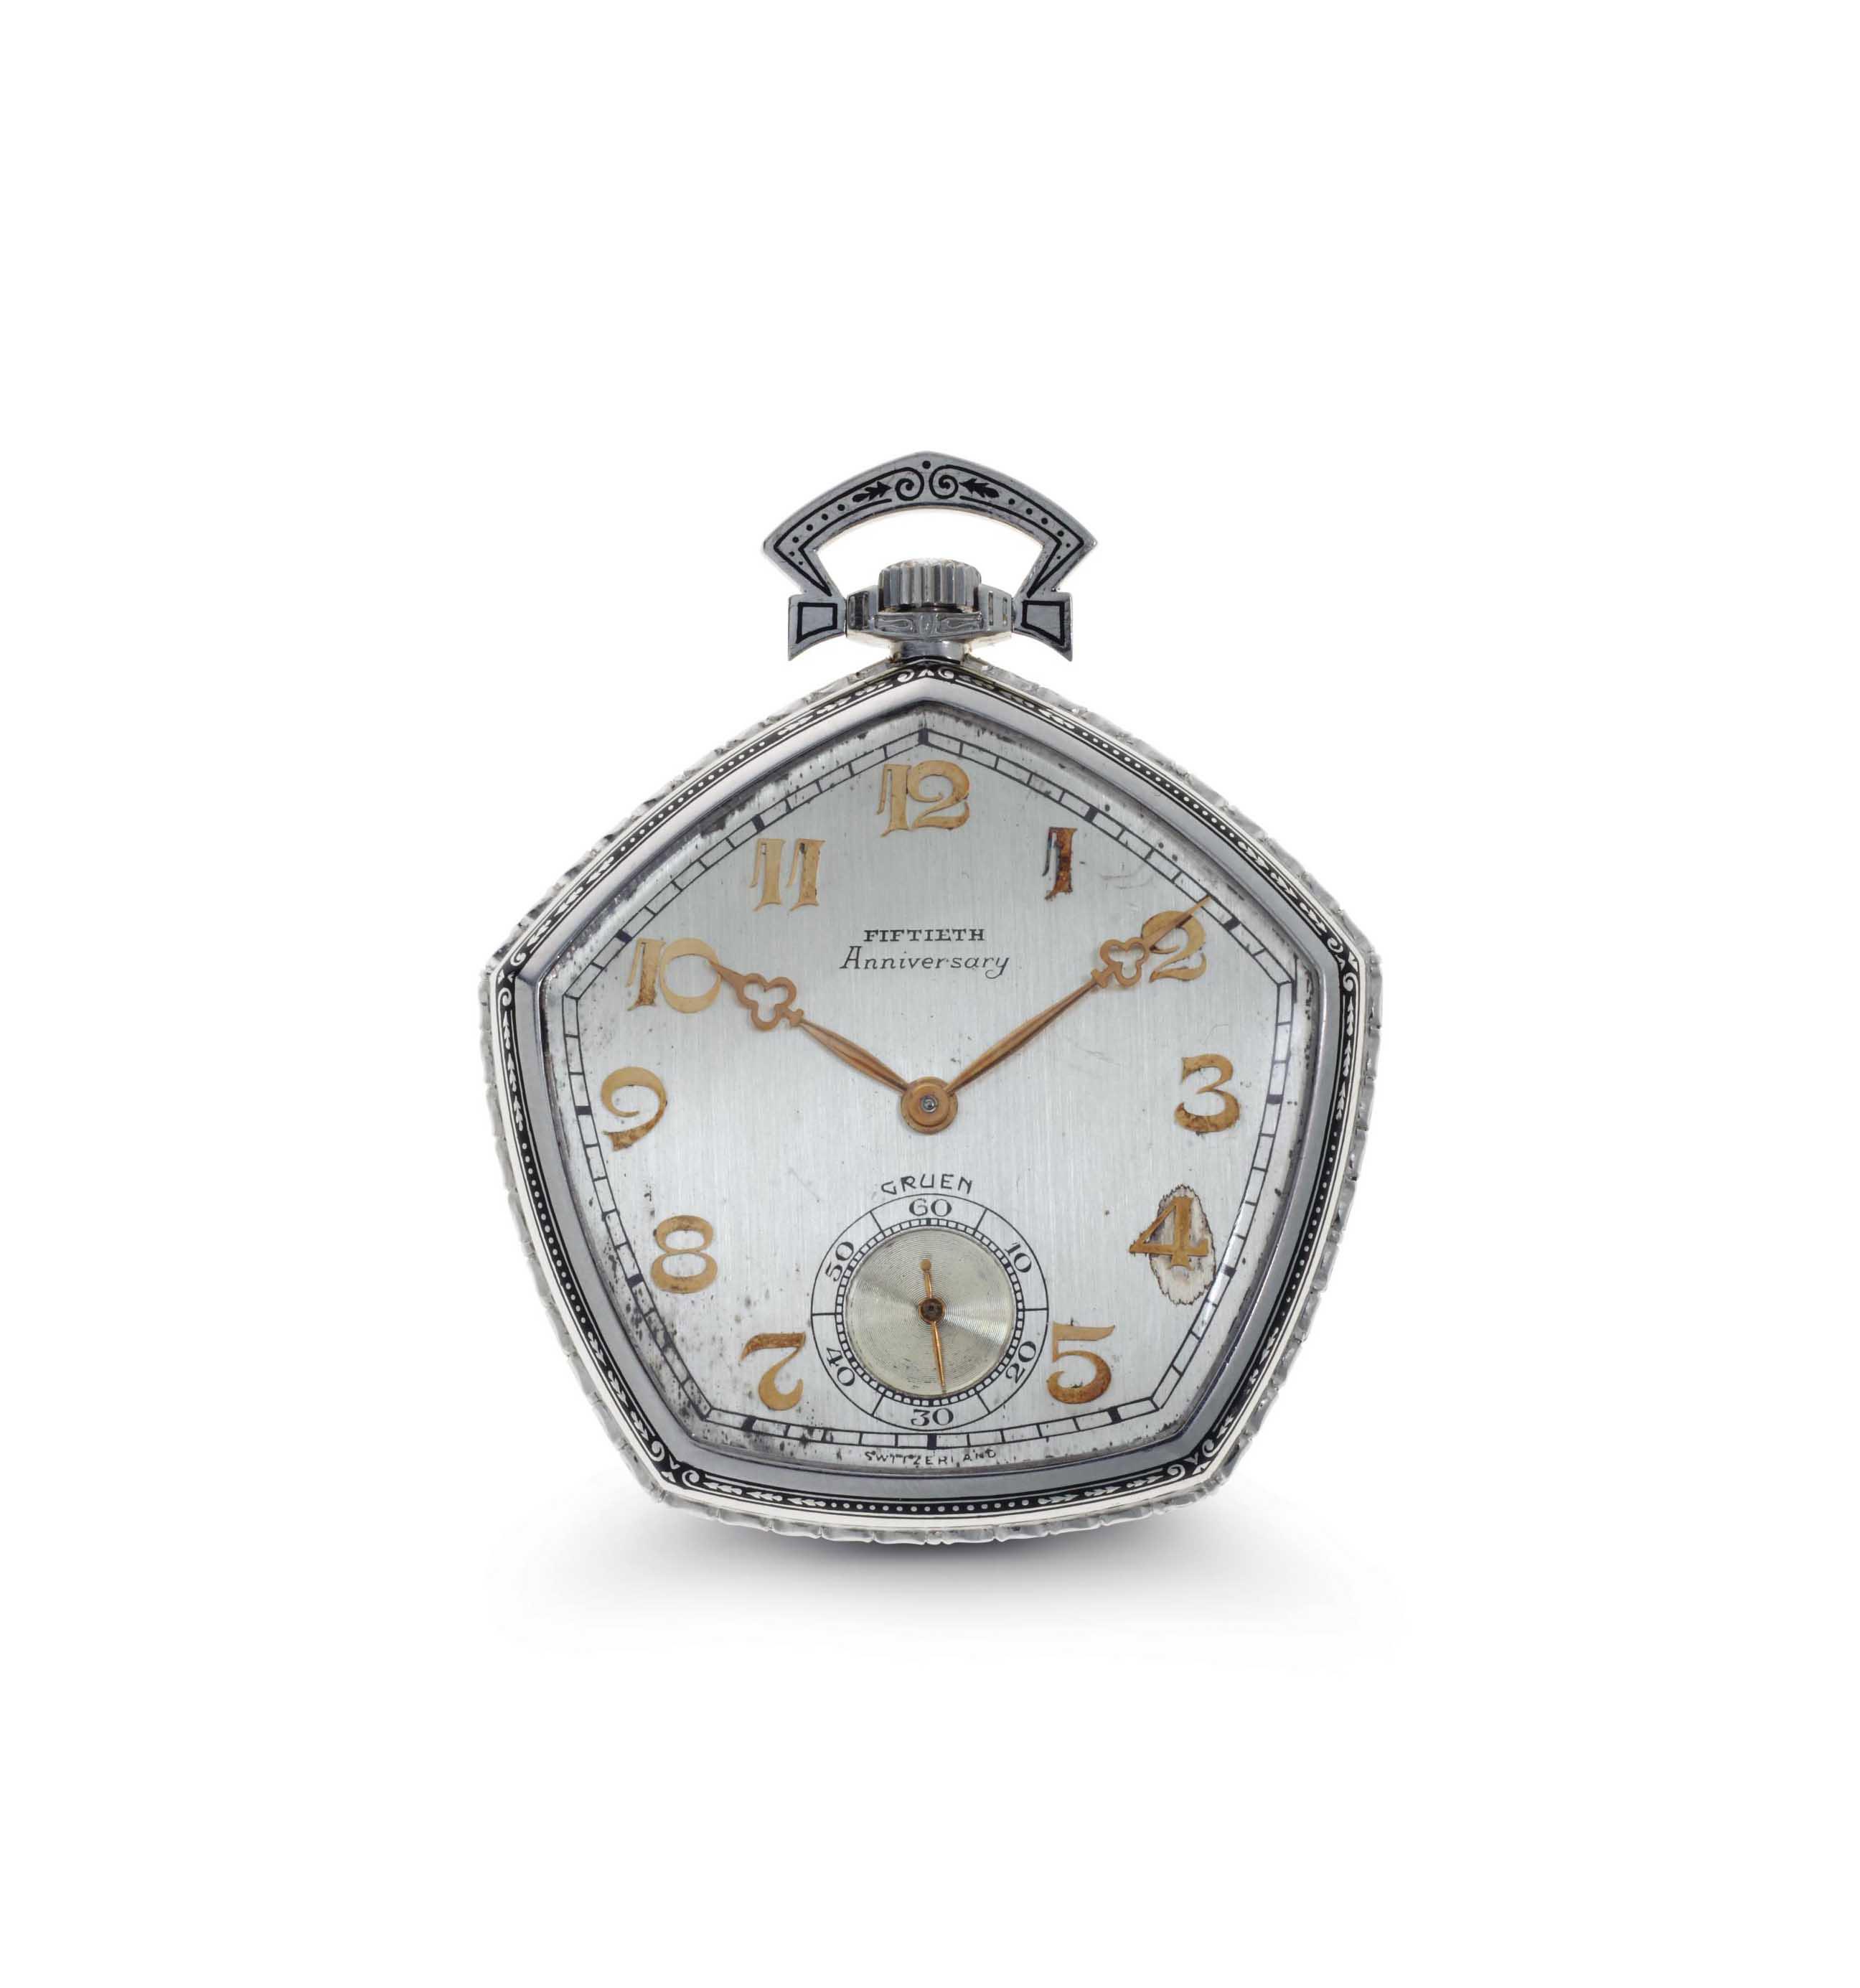 Gruen. A Fine Platinum Pentagonal Openface Keyless Anniversary Pocket Watch